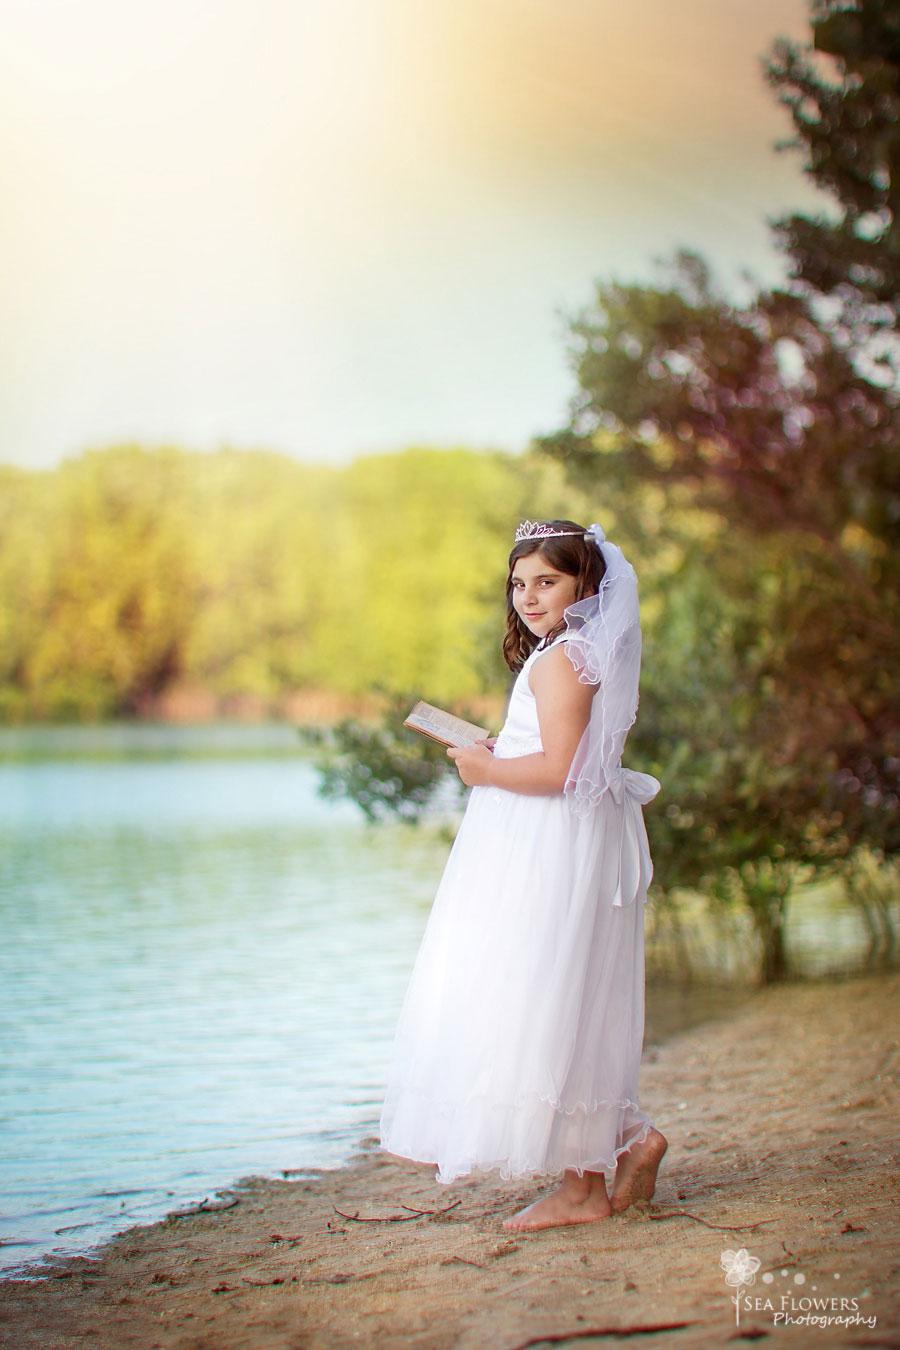 First Communion - Jupiter Beach Photography - Sea Flowres Photography Children Family Photography